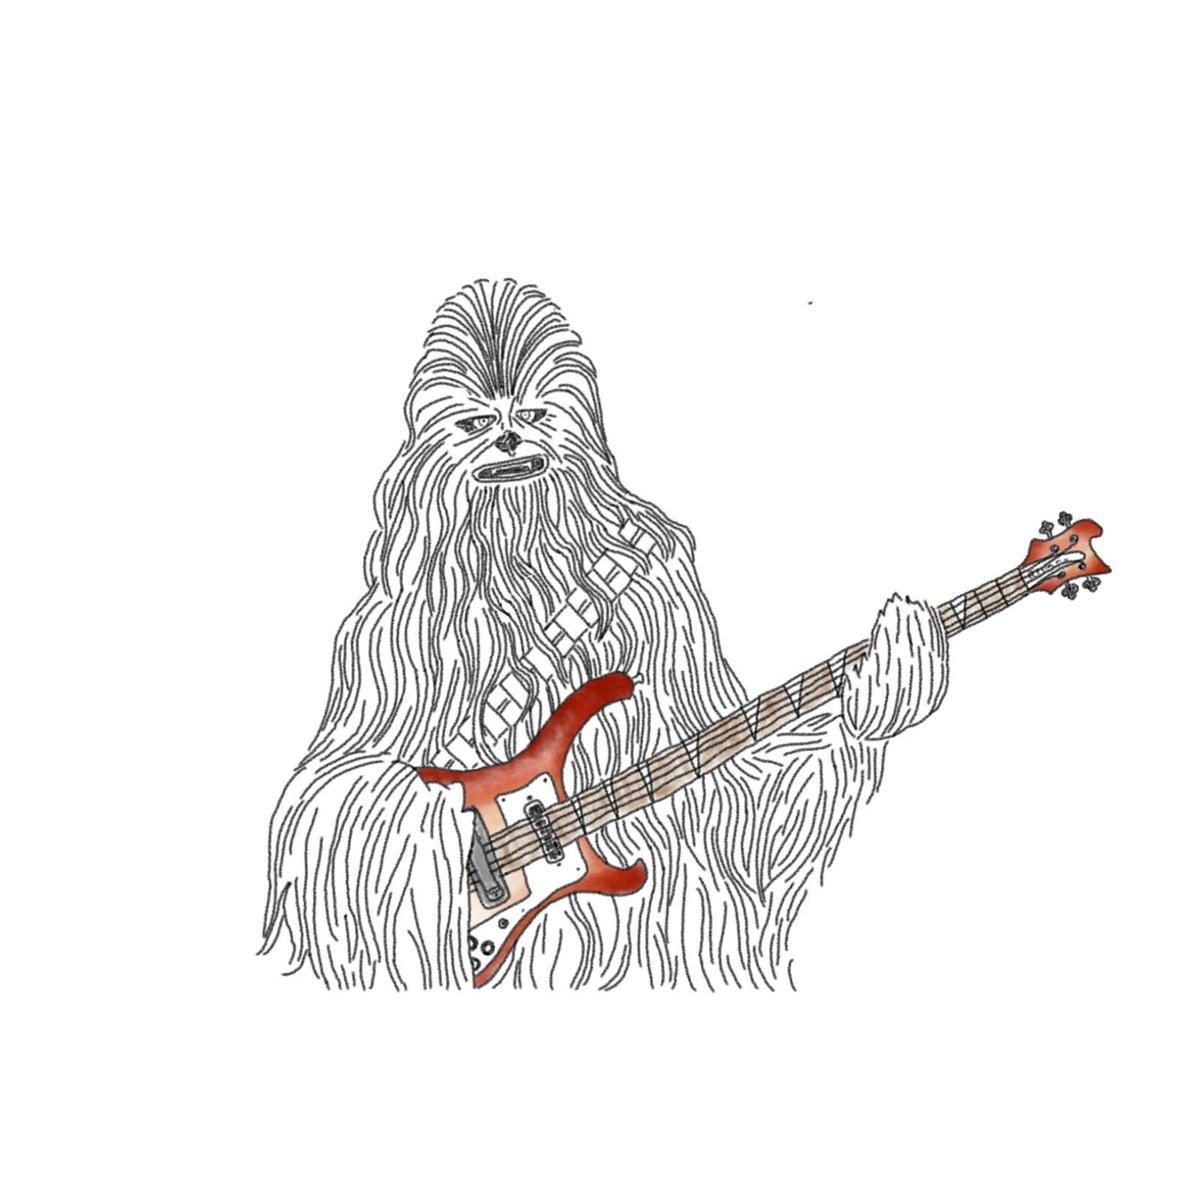 Sillo On Twitter チューバッカとリッケンバッカー Chewbacca